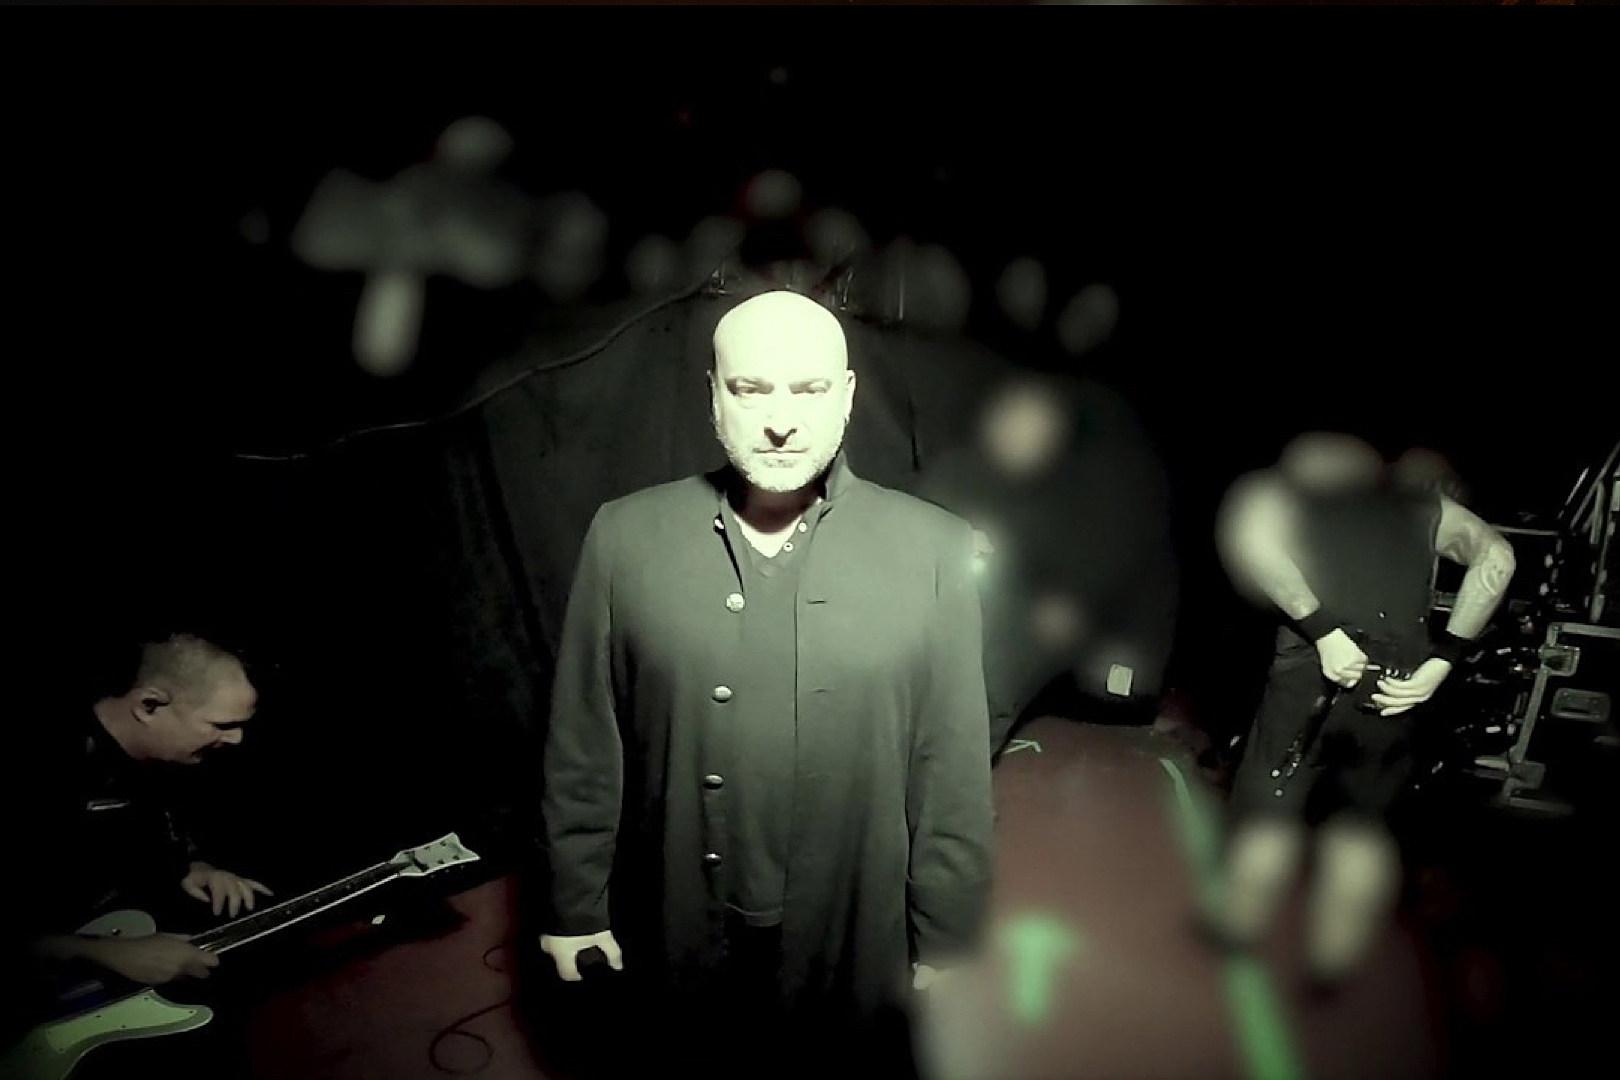 Disturbed's David Draiman Deletes His Twitter Account